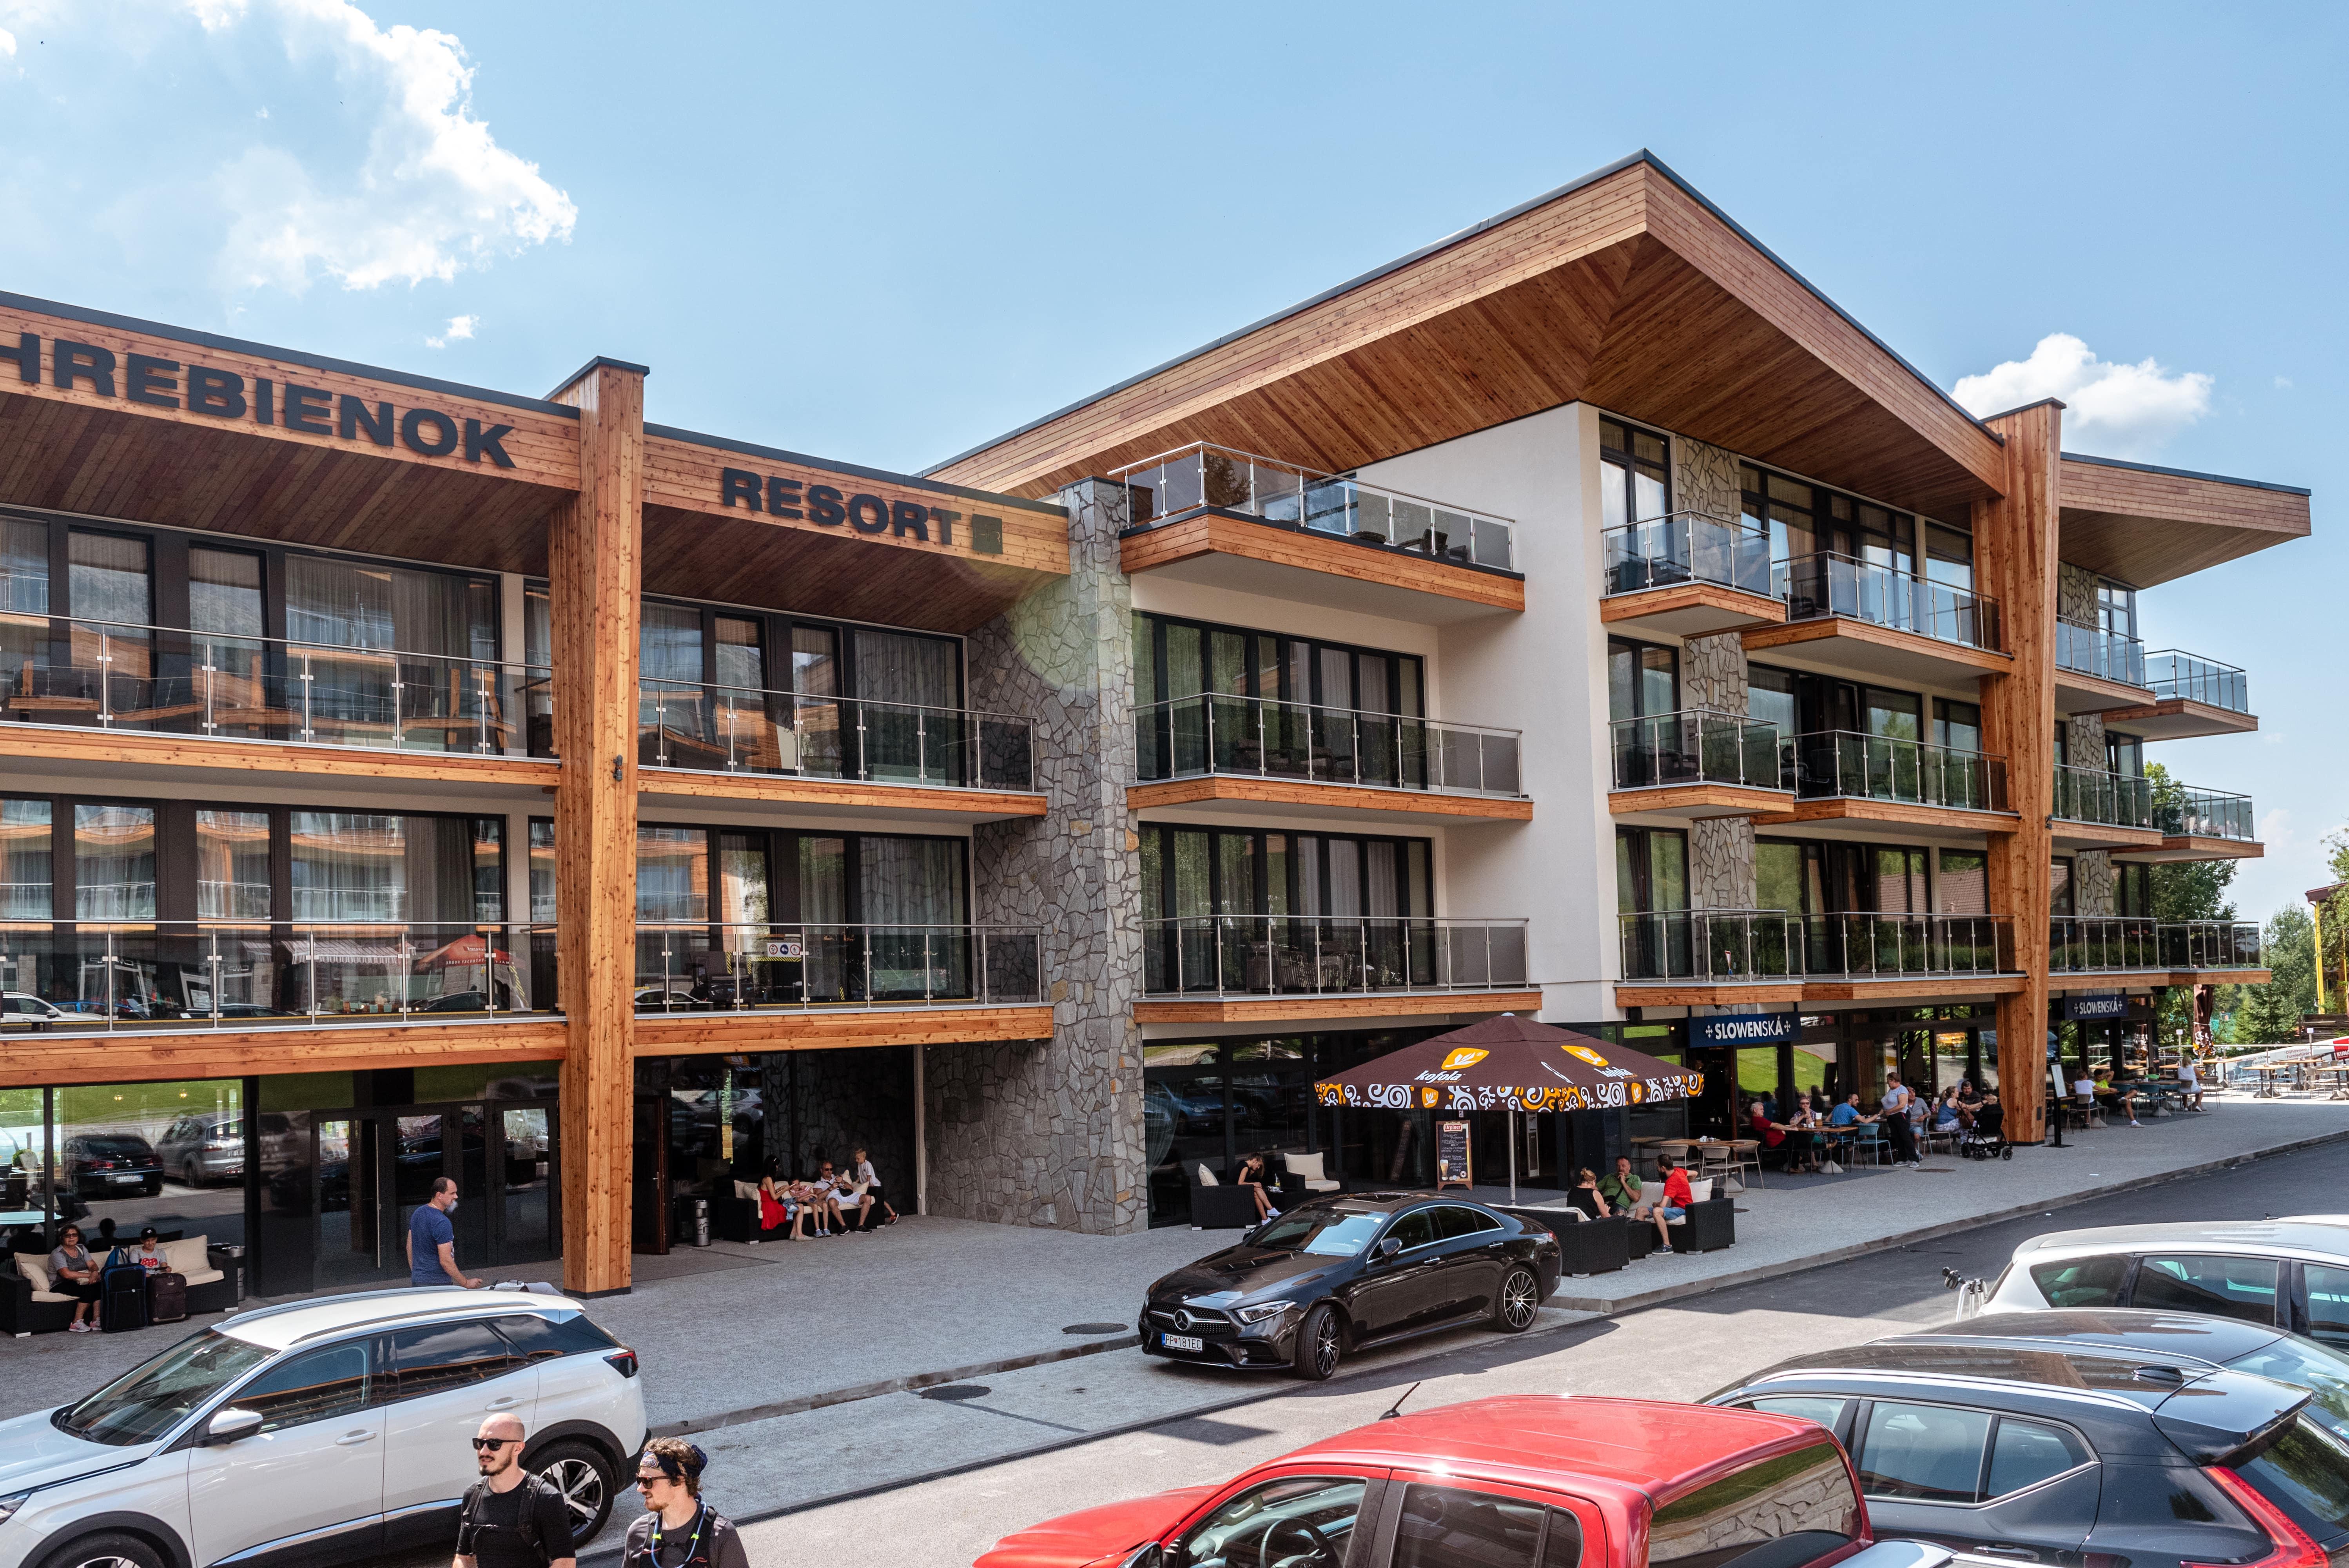 Hrebienok Hotel Resort spredu